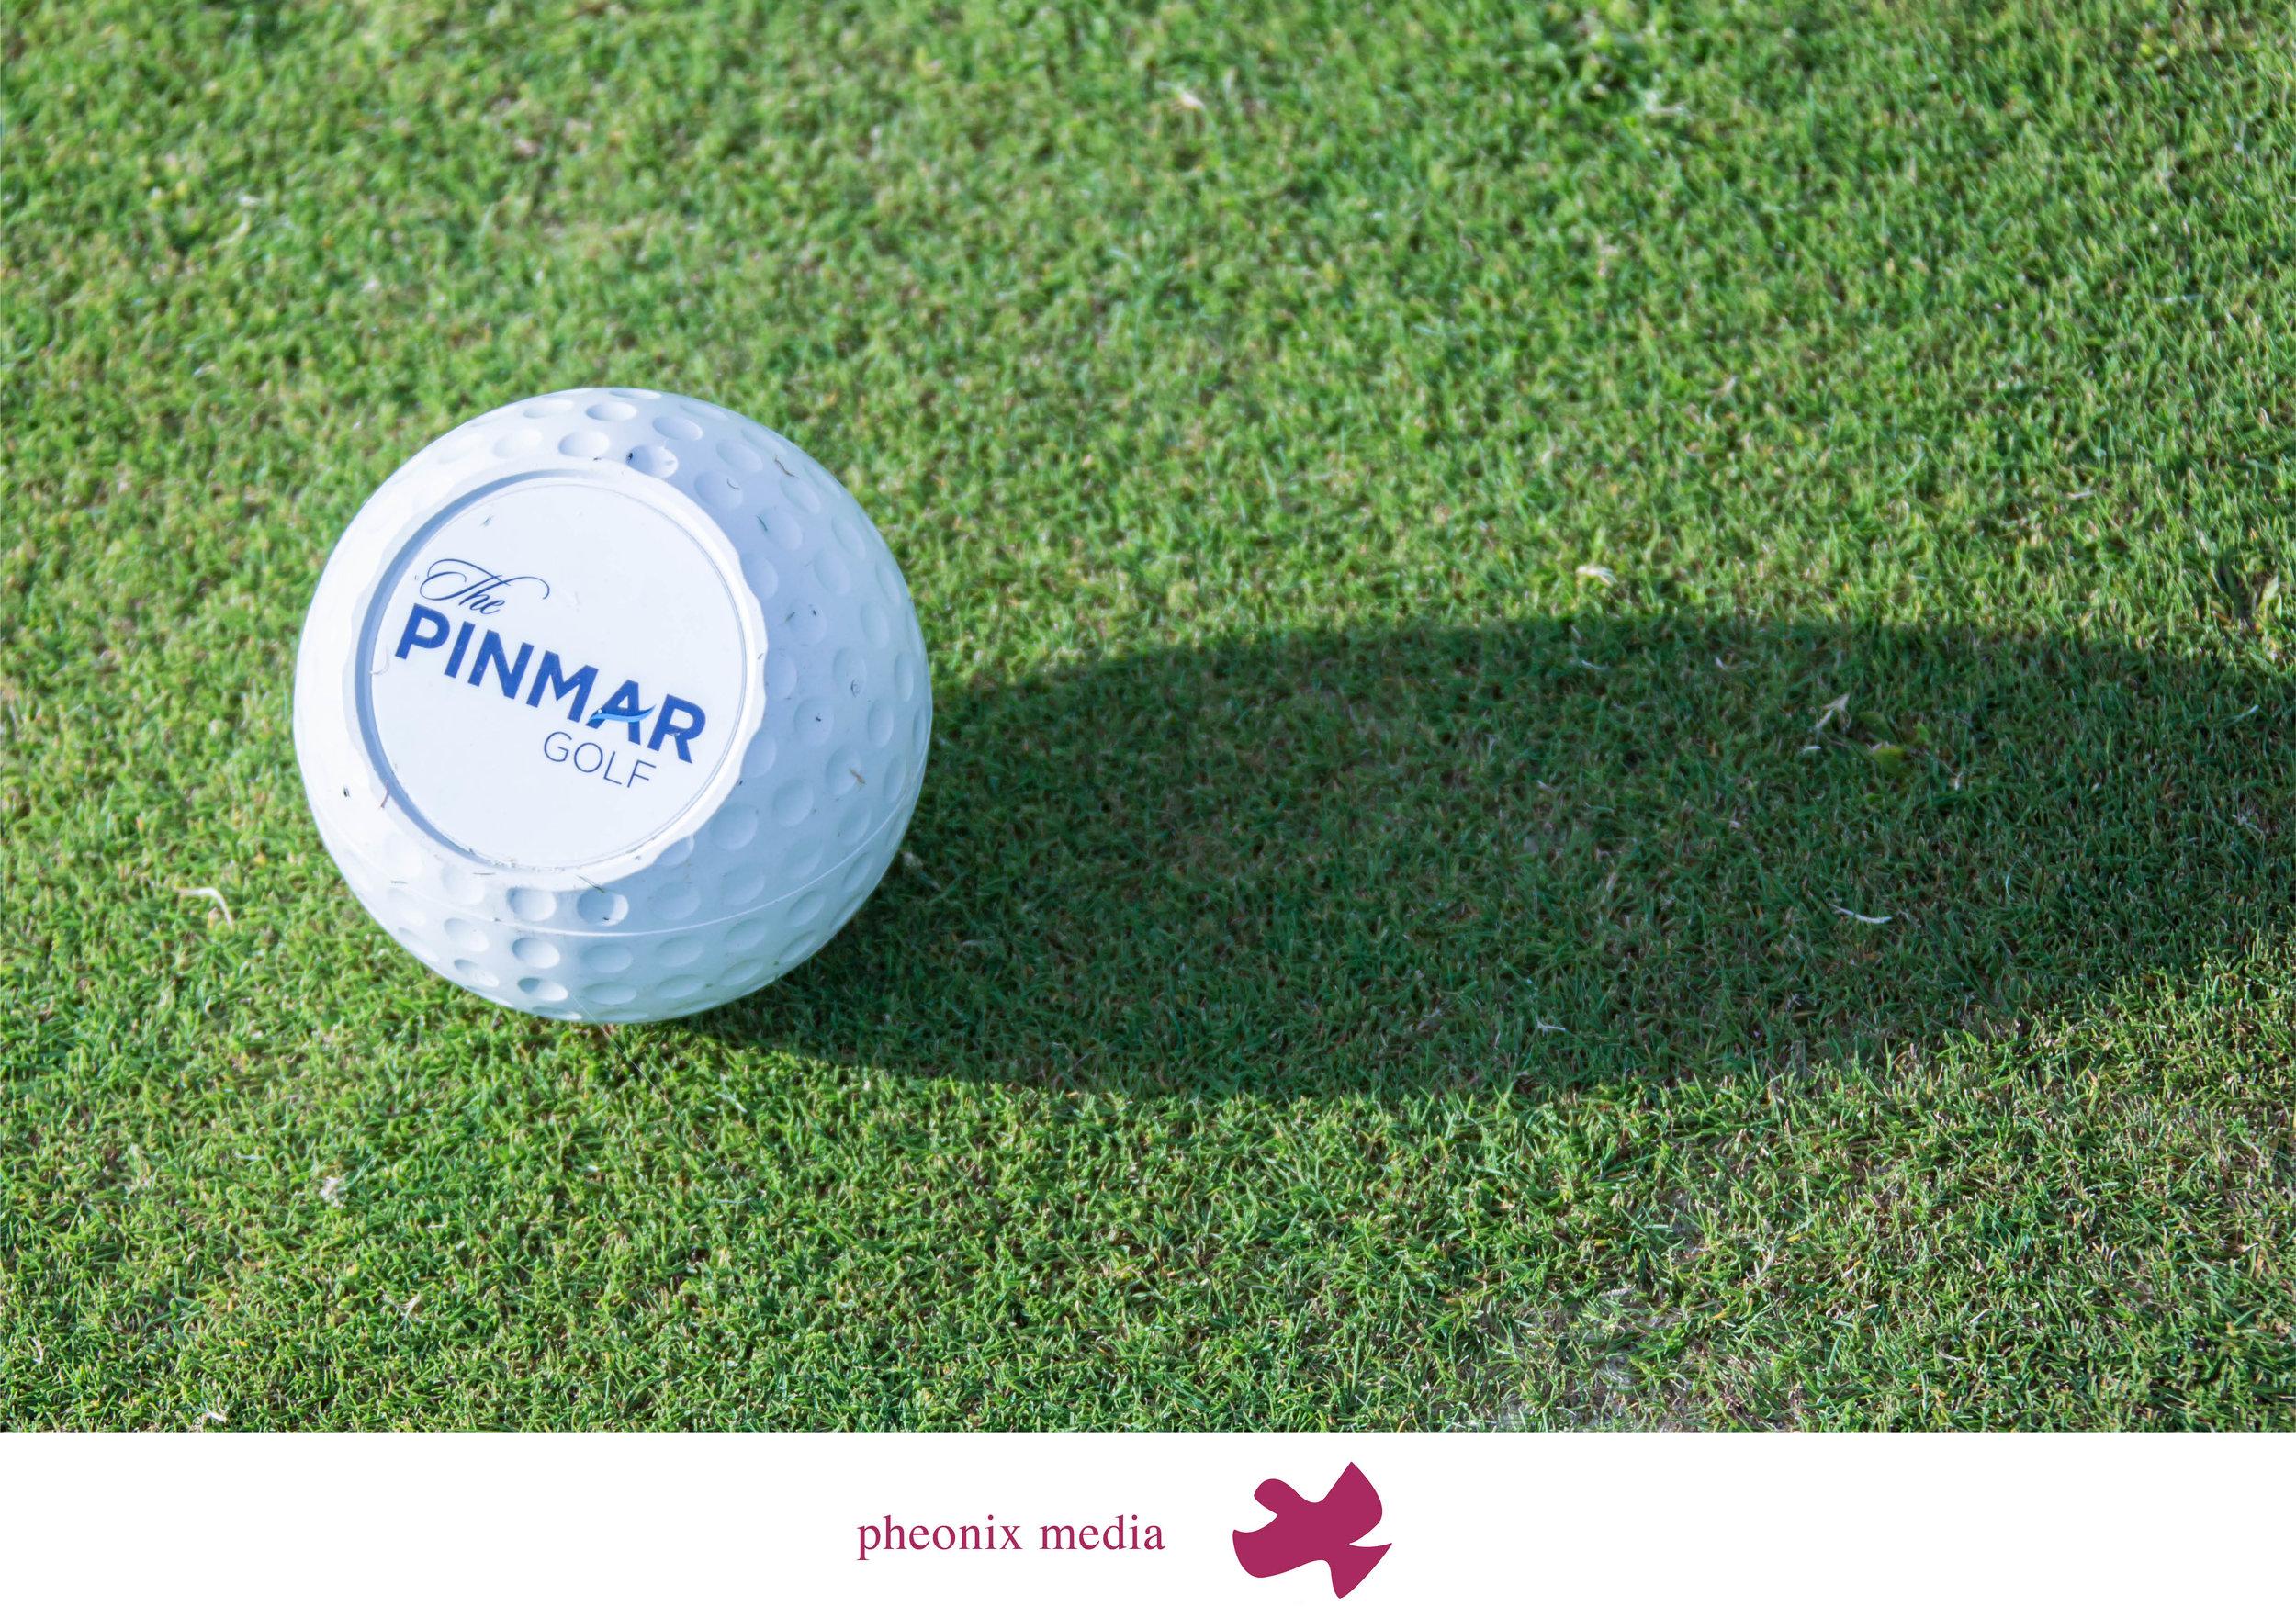 pheonix media pinmar2.jpg